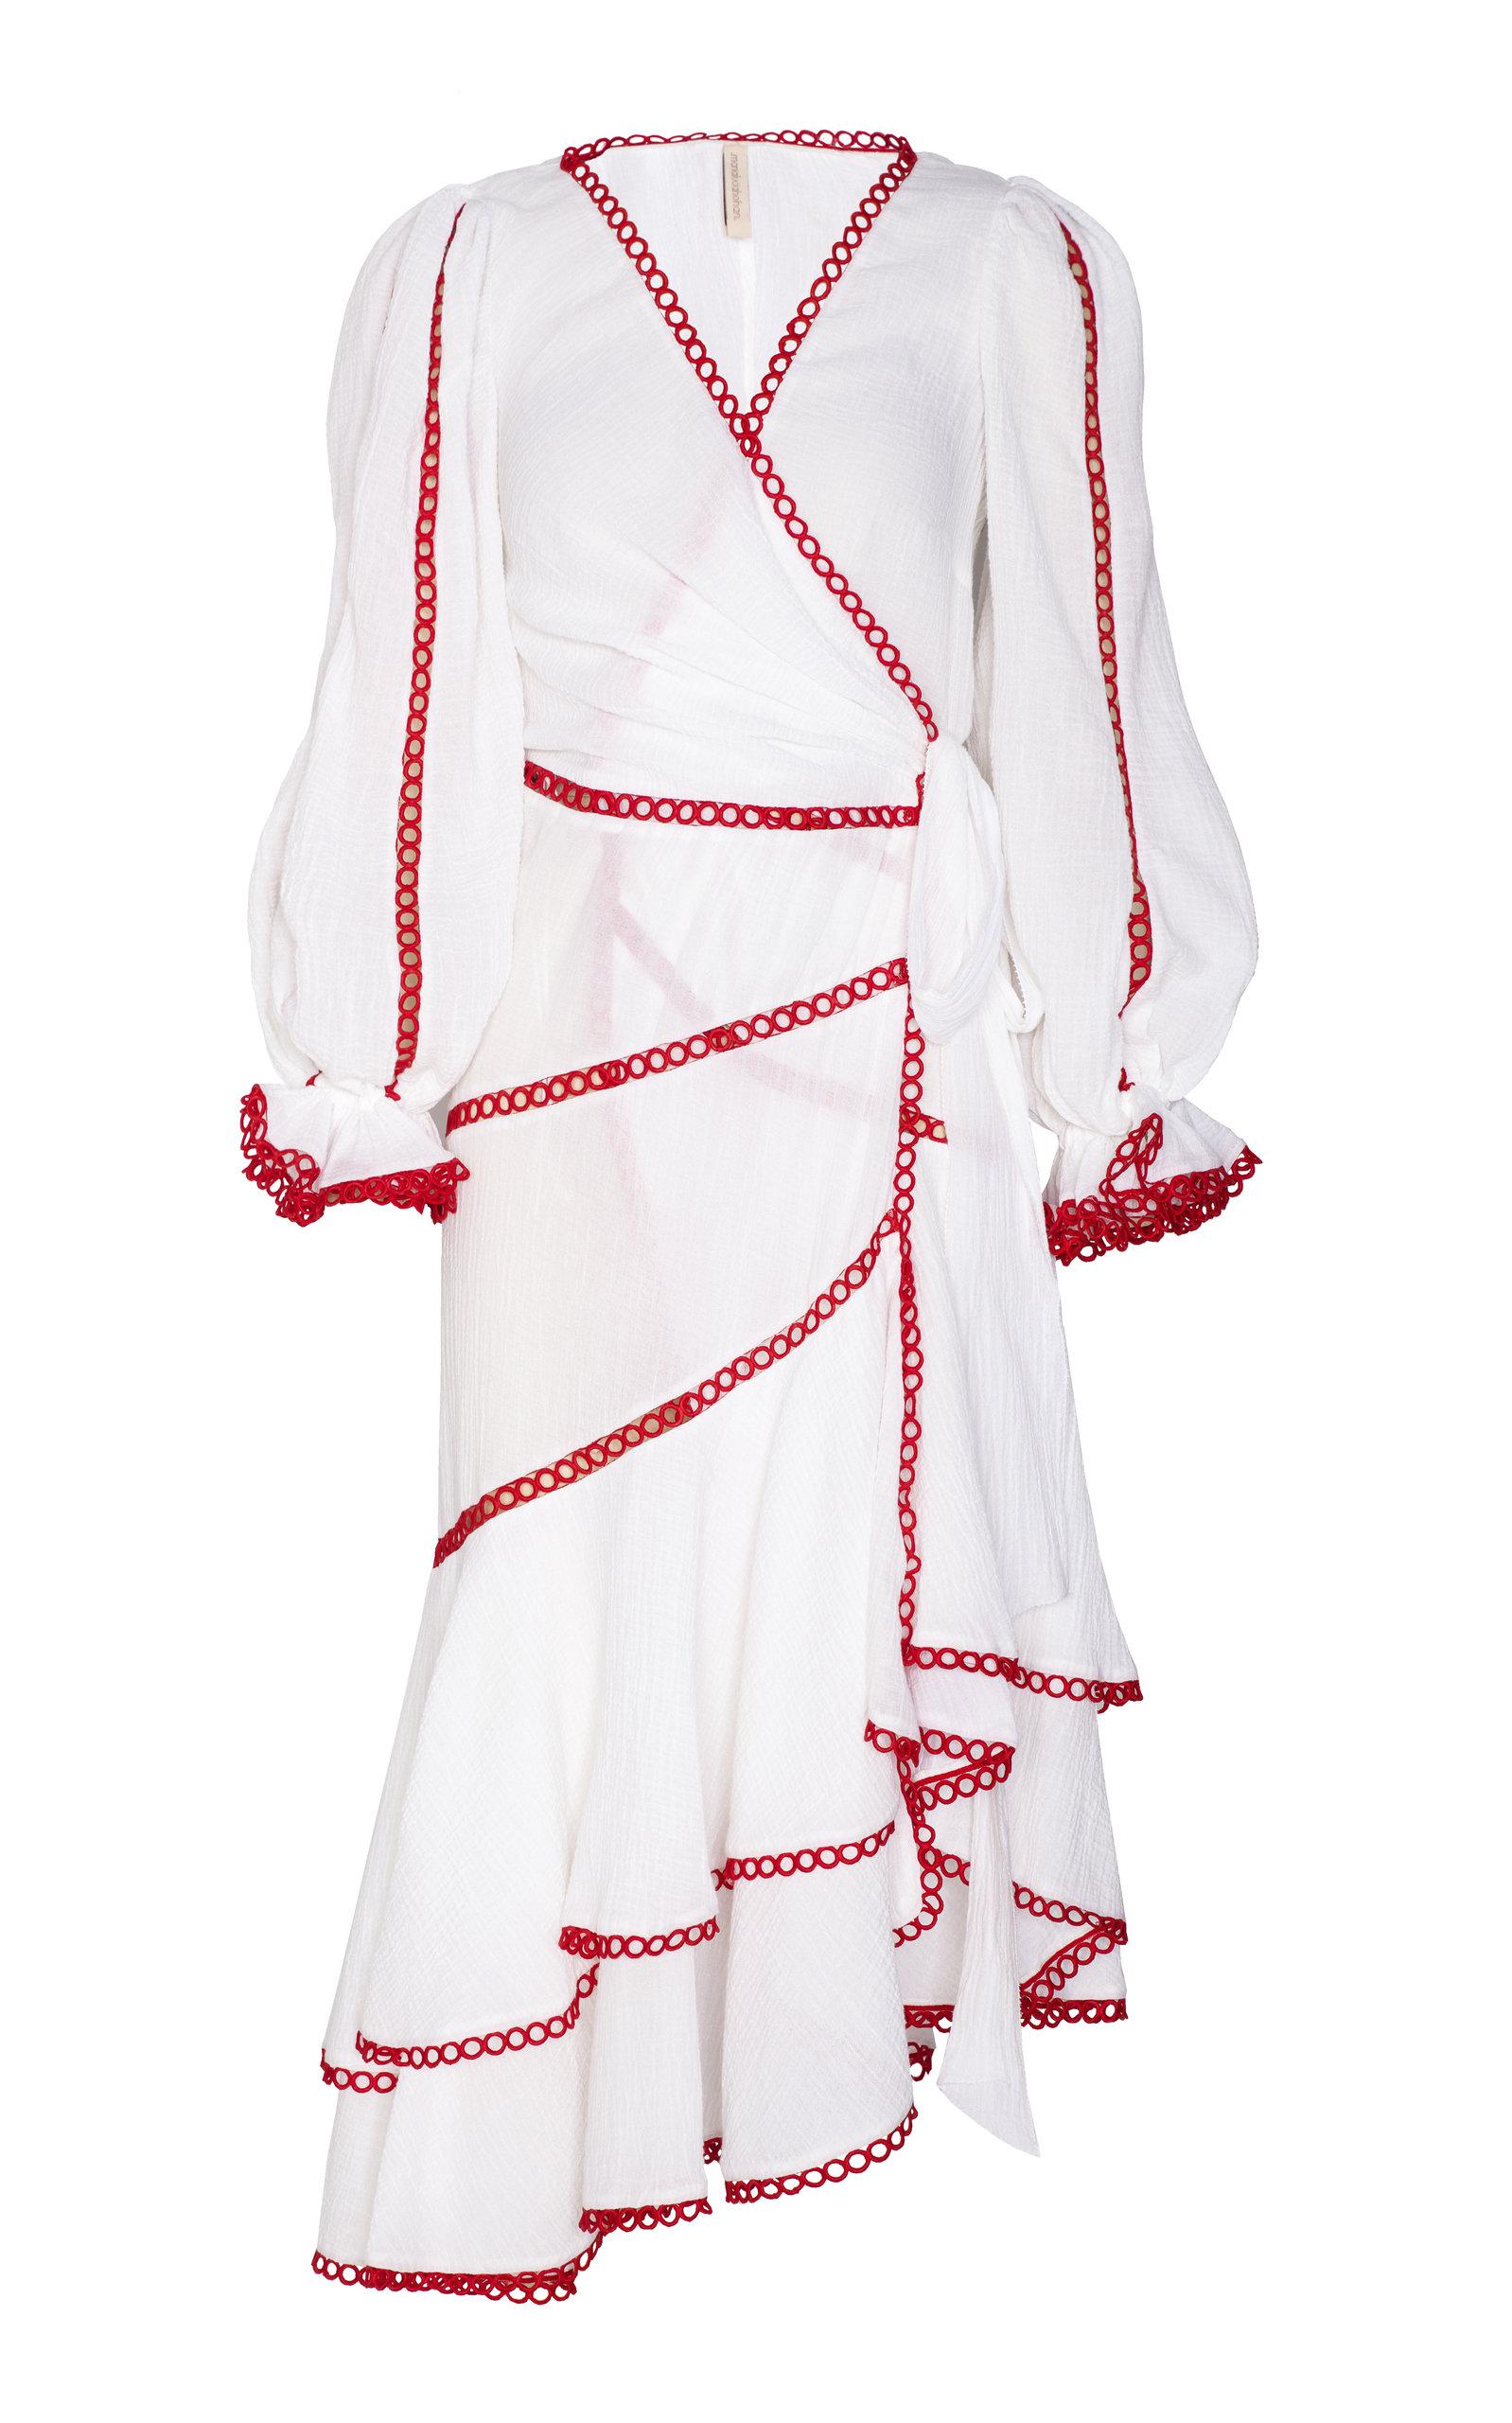 MARIA LUCIA HOHAN JOANNA COTTON VOILE WRAP DRESS